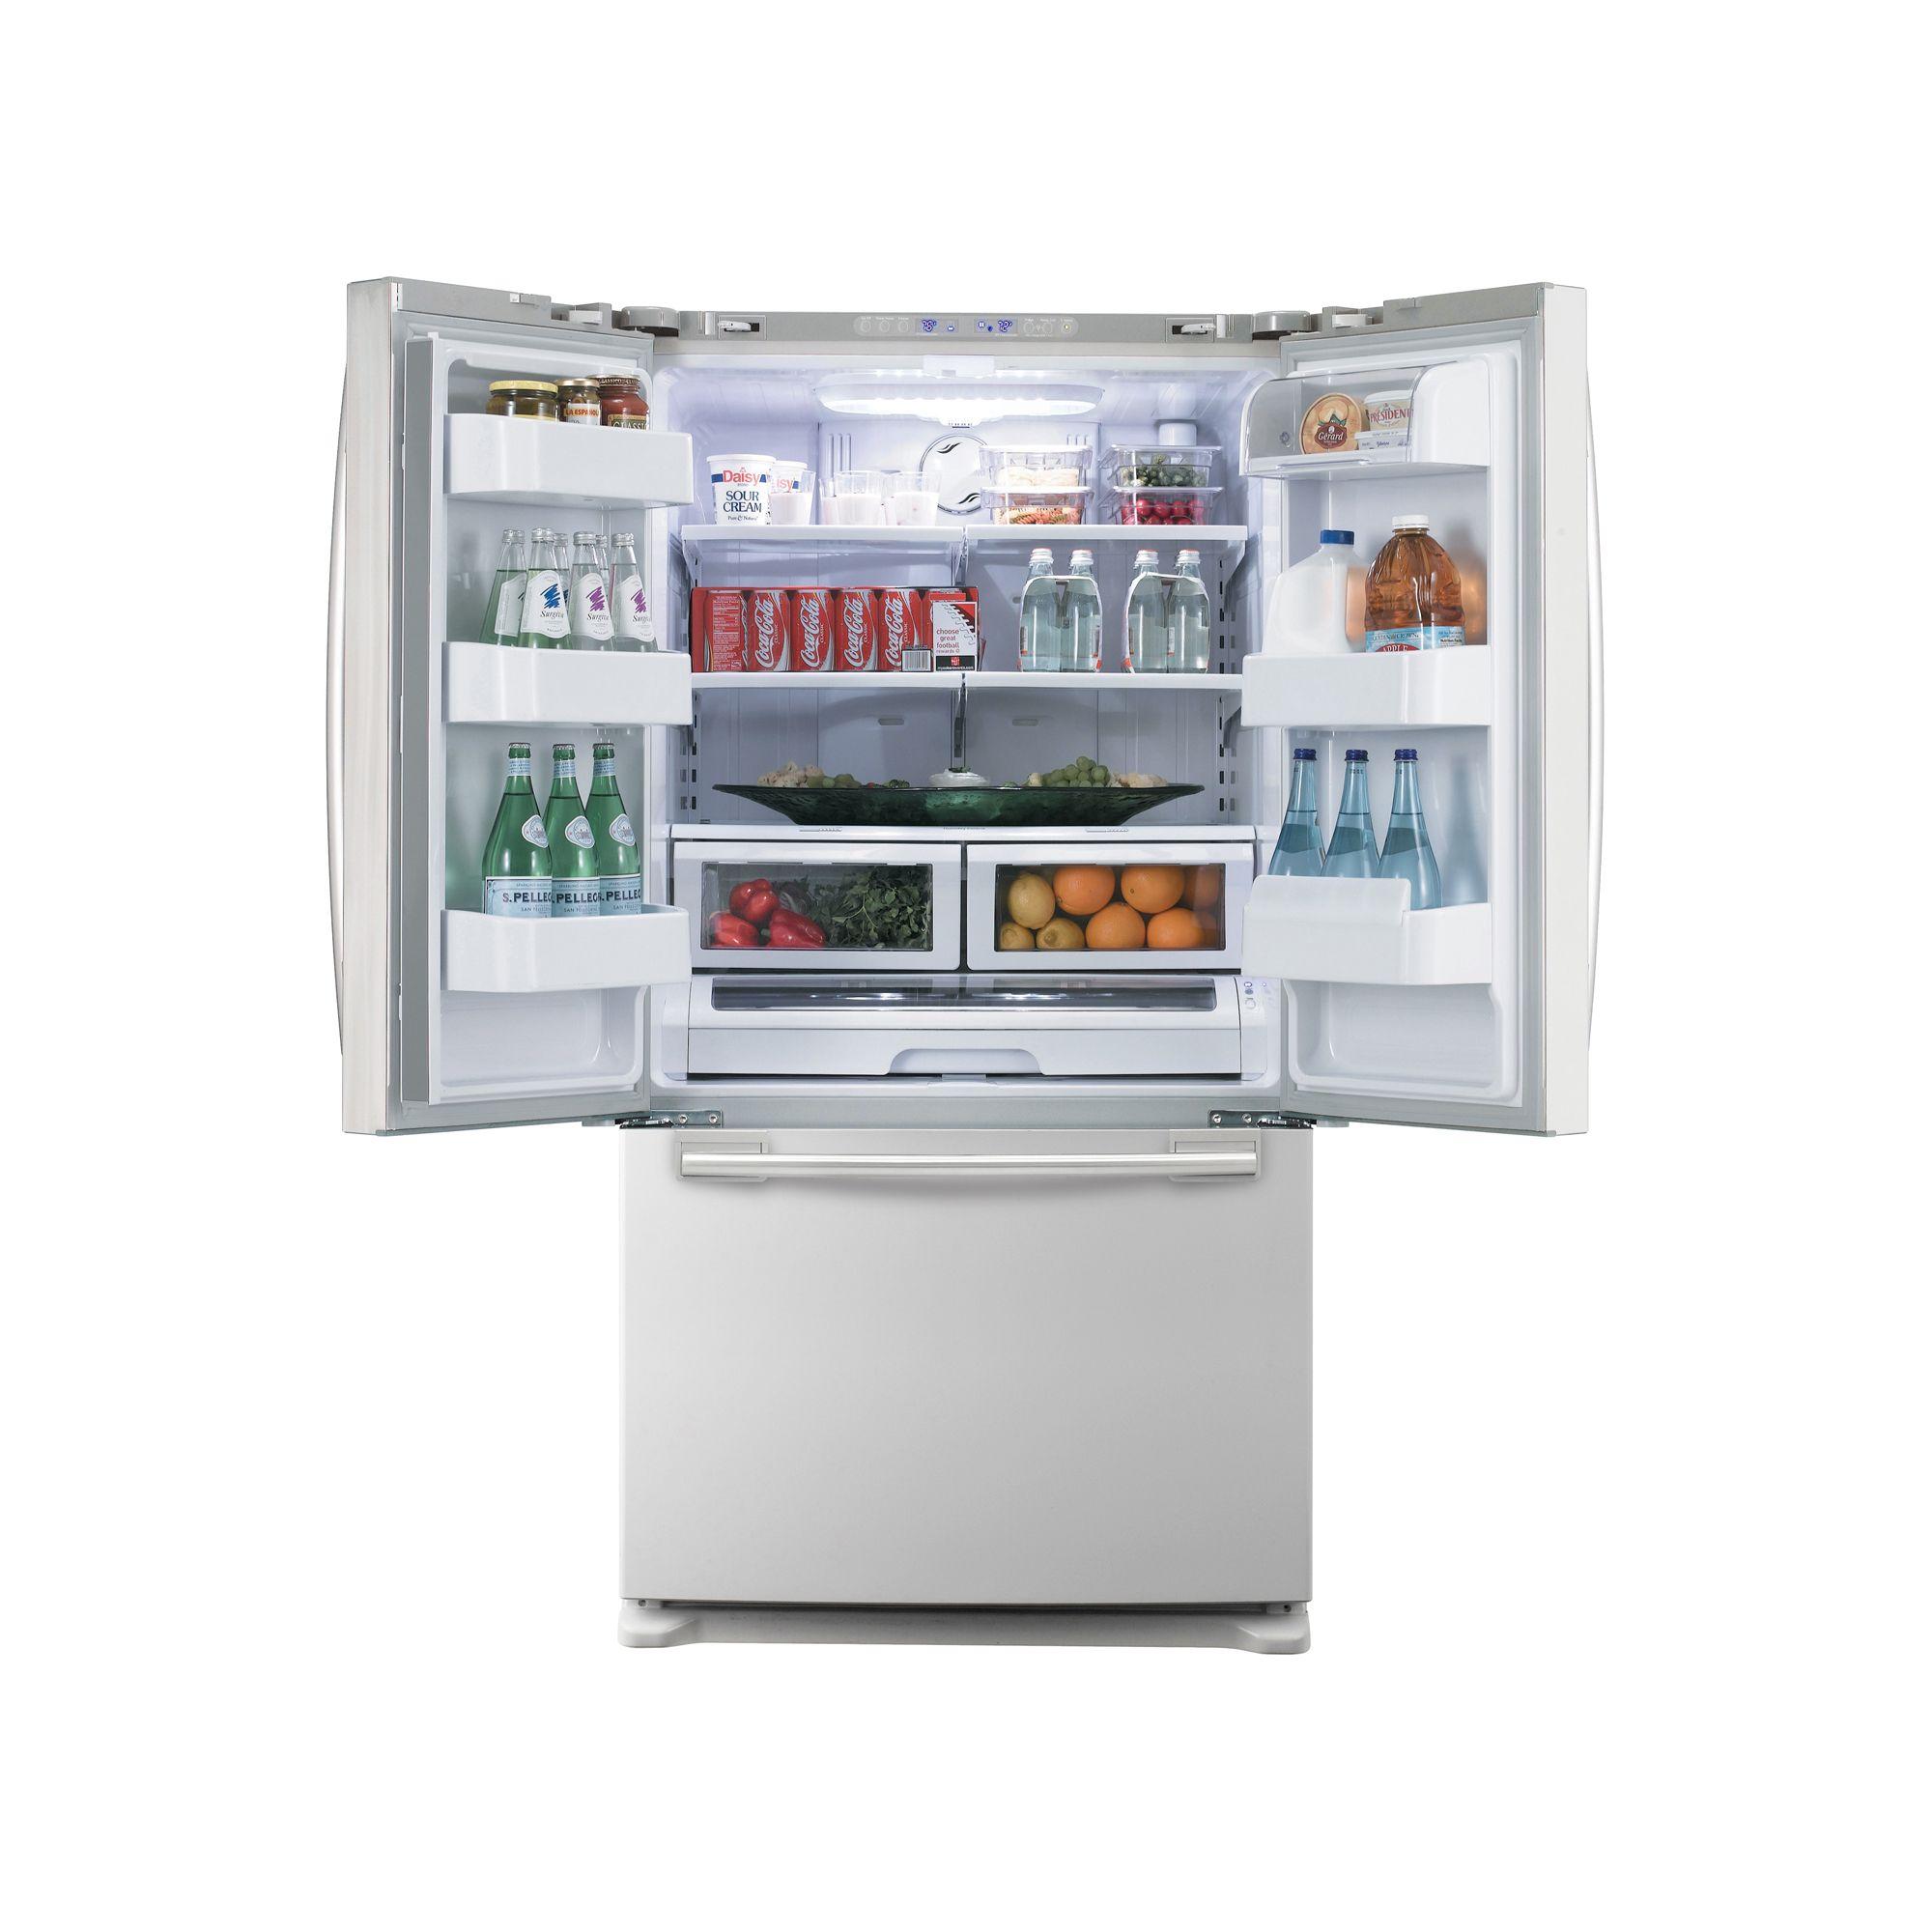 Samsung 26.0 cu. ft. French-Door Bottom Freezer Refrigerator, White (Model RF266AE)